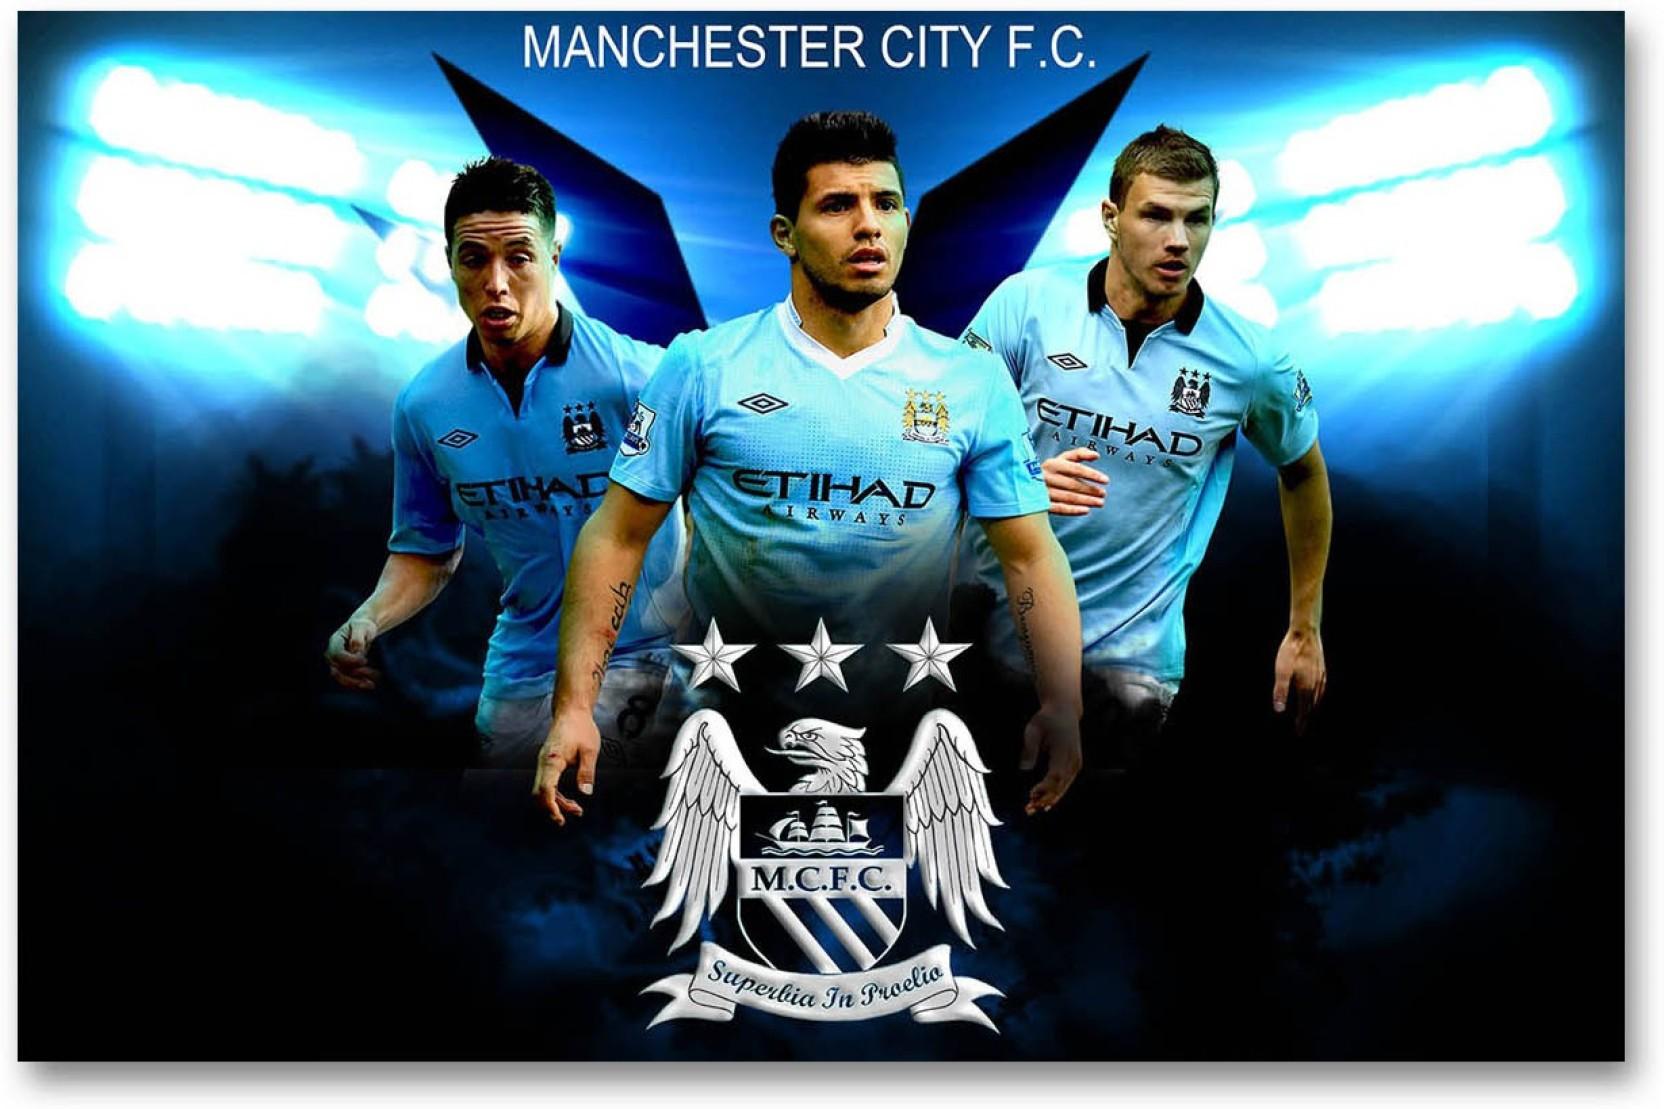 best service 53e1a 40898 Manchester City Football Club Wall Poster - Sergio Agüero ...